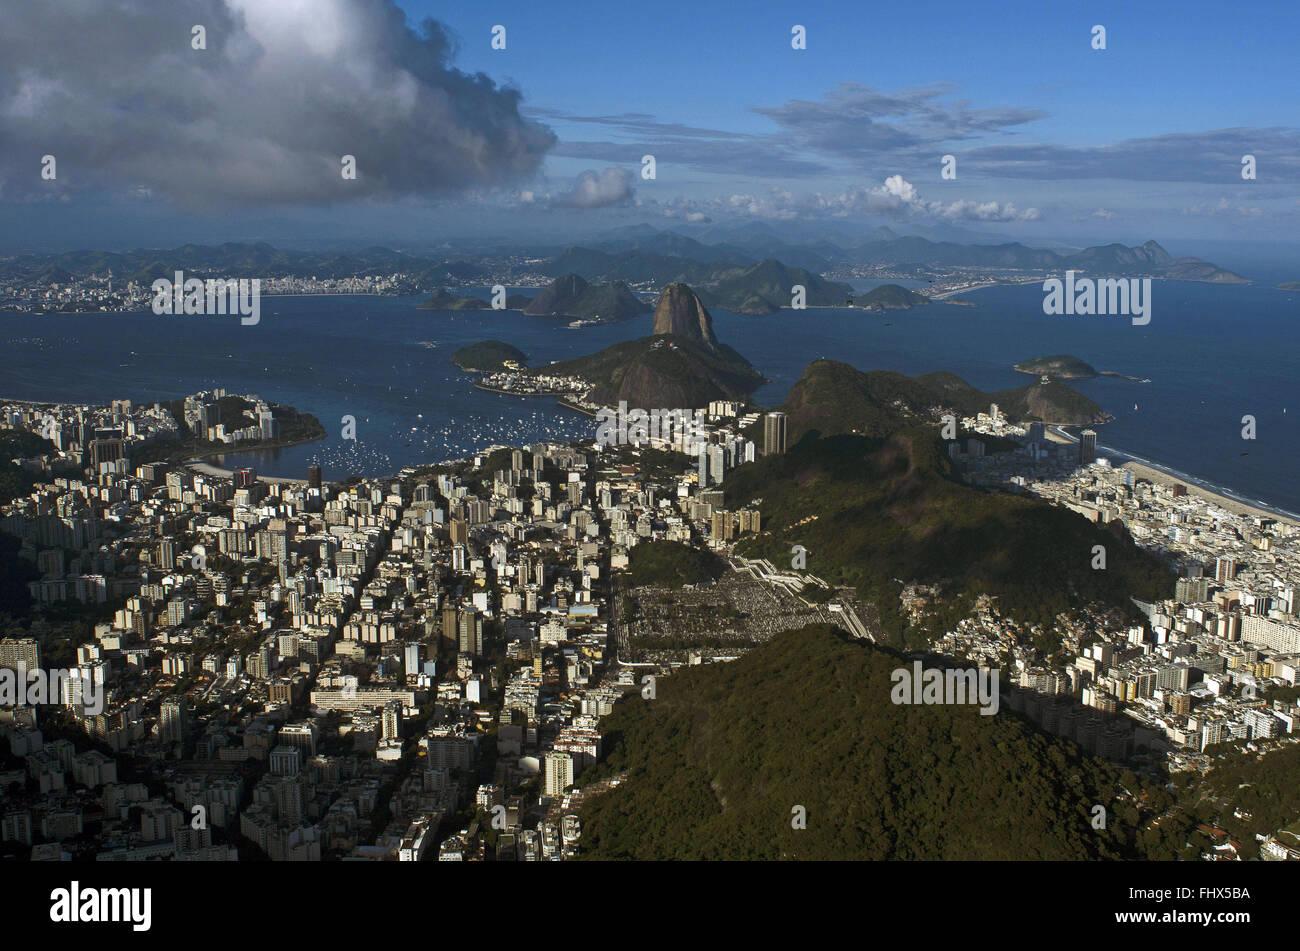 Cove of Botafogo in Guanabara Bay - Pao de Acucar and Morro da Urca Stock Photo